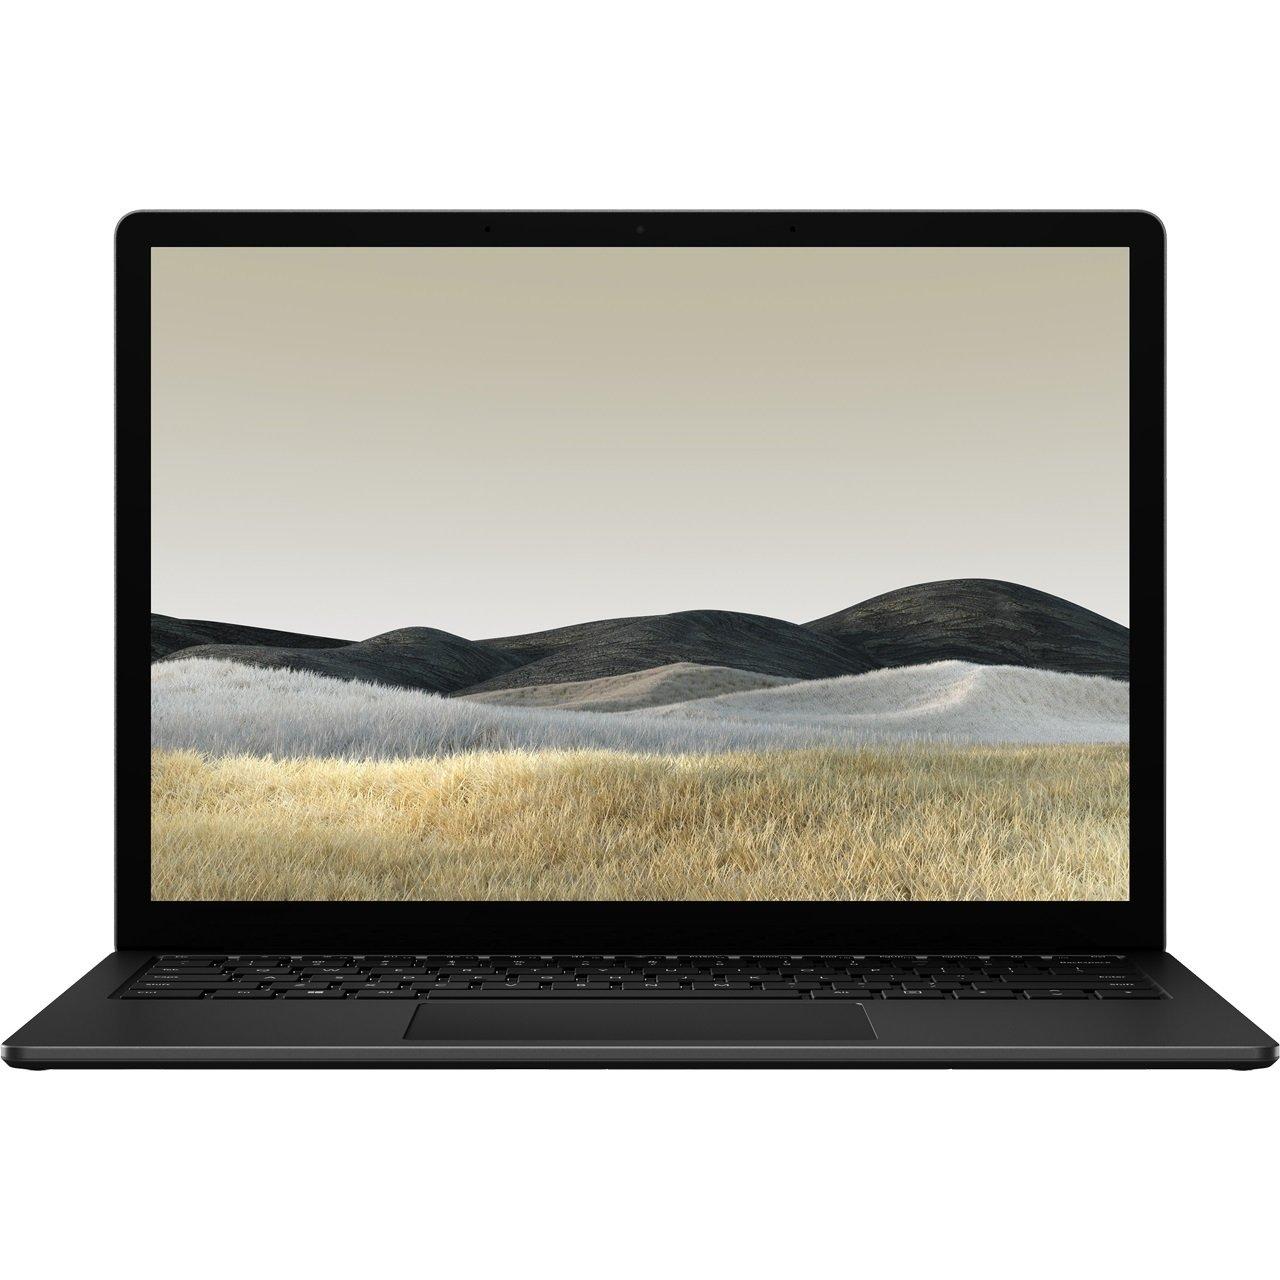 Microsoft Surface Laptop 3 13.5in i7 16GB 512GB - Black